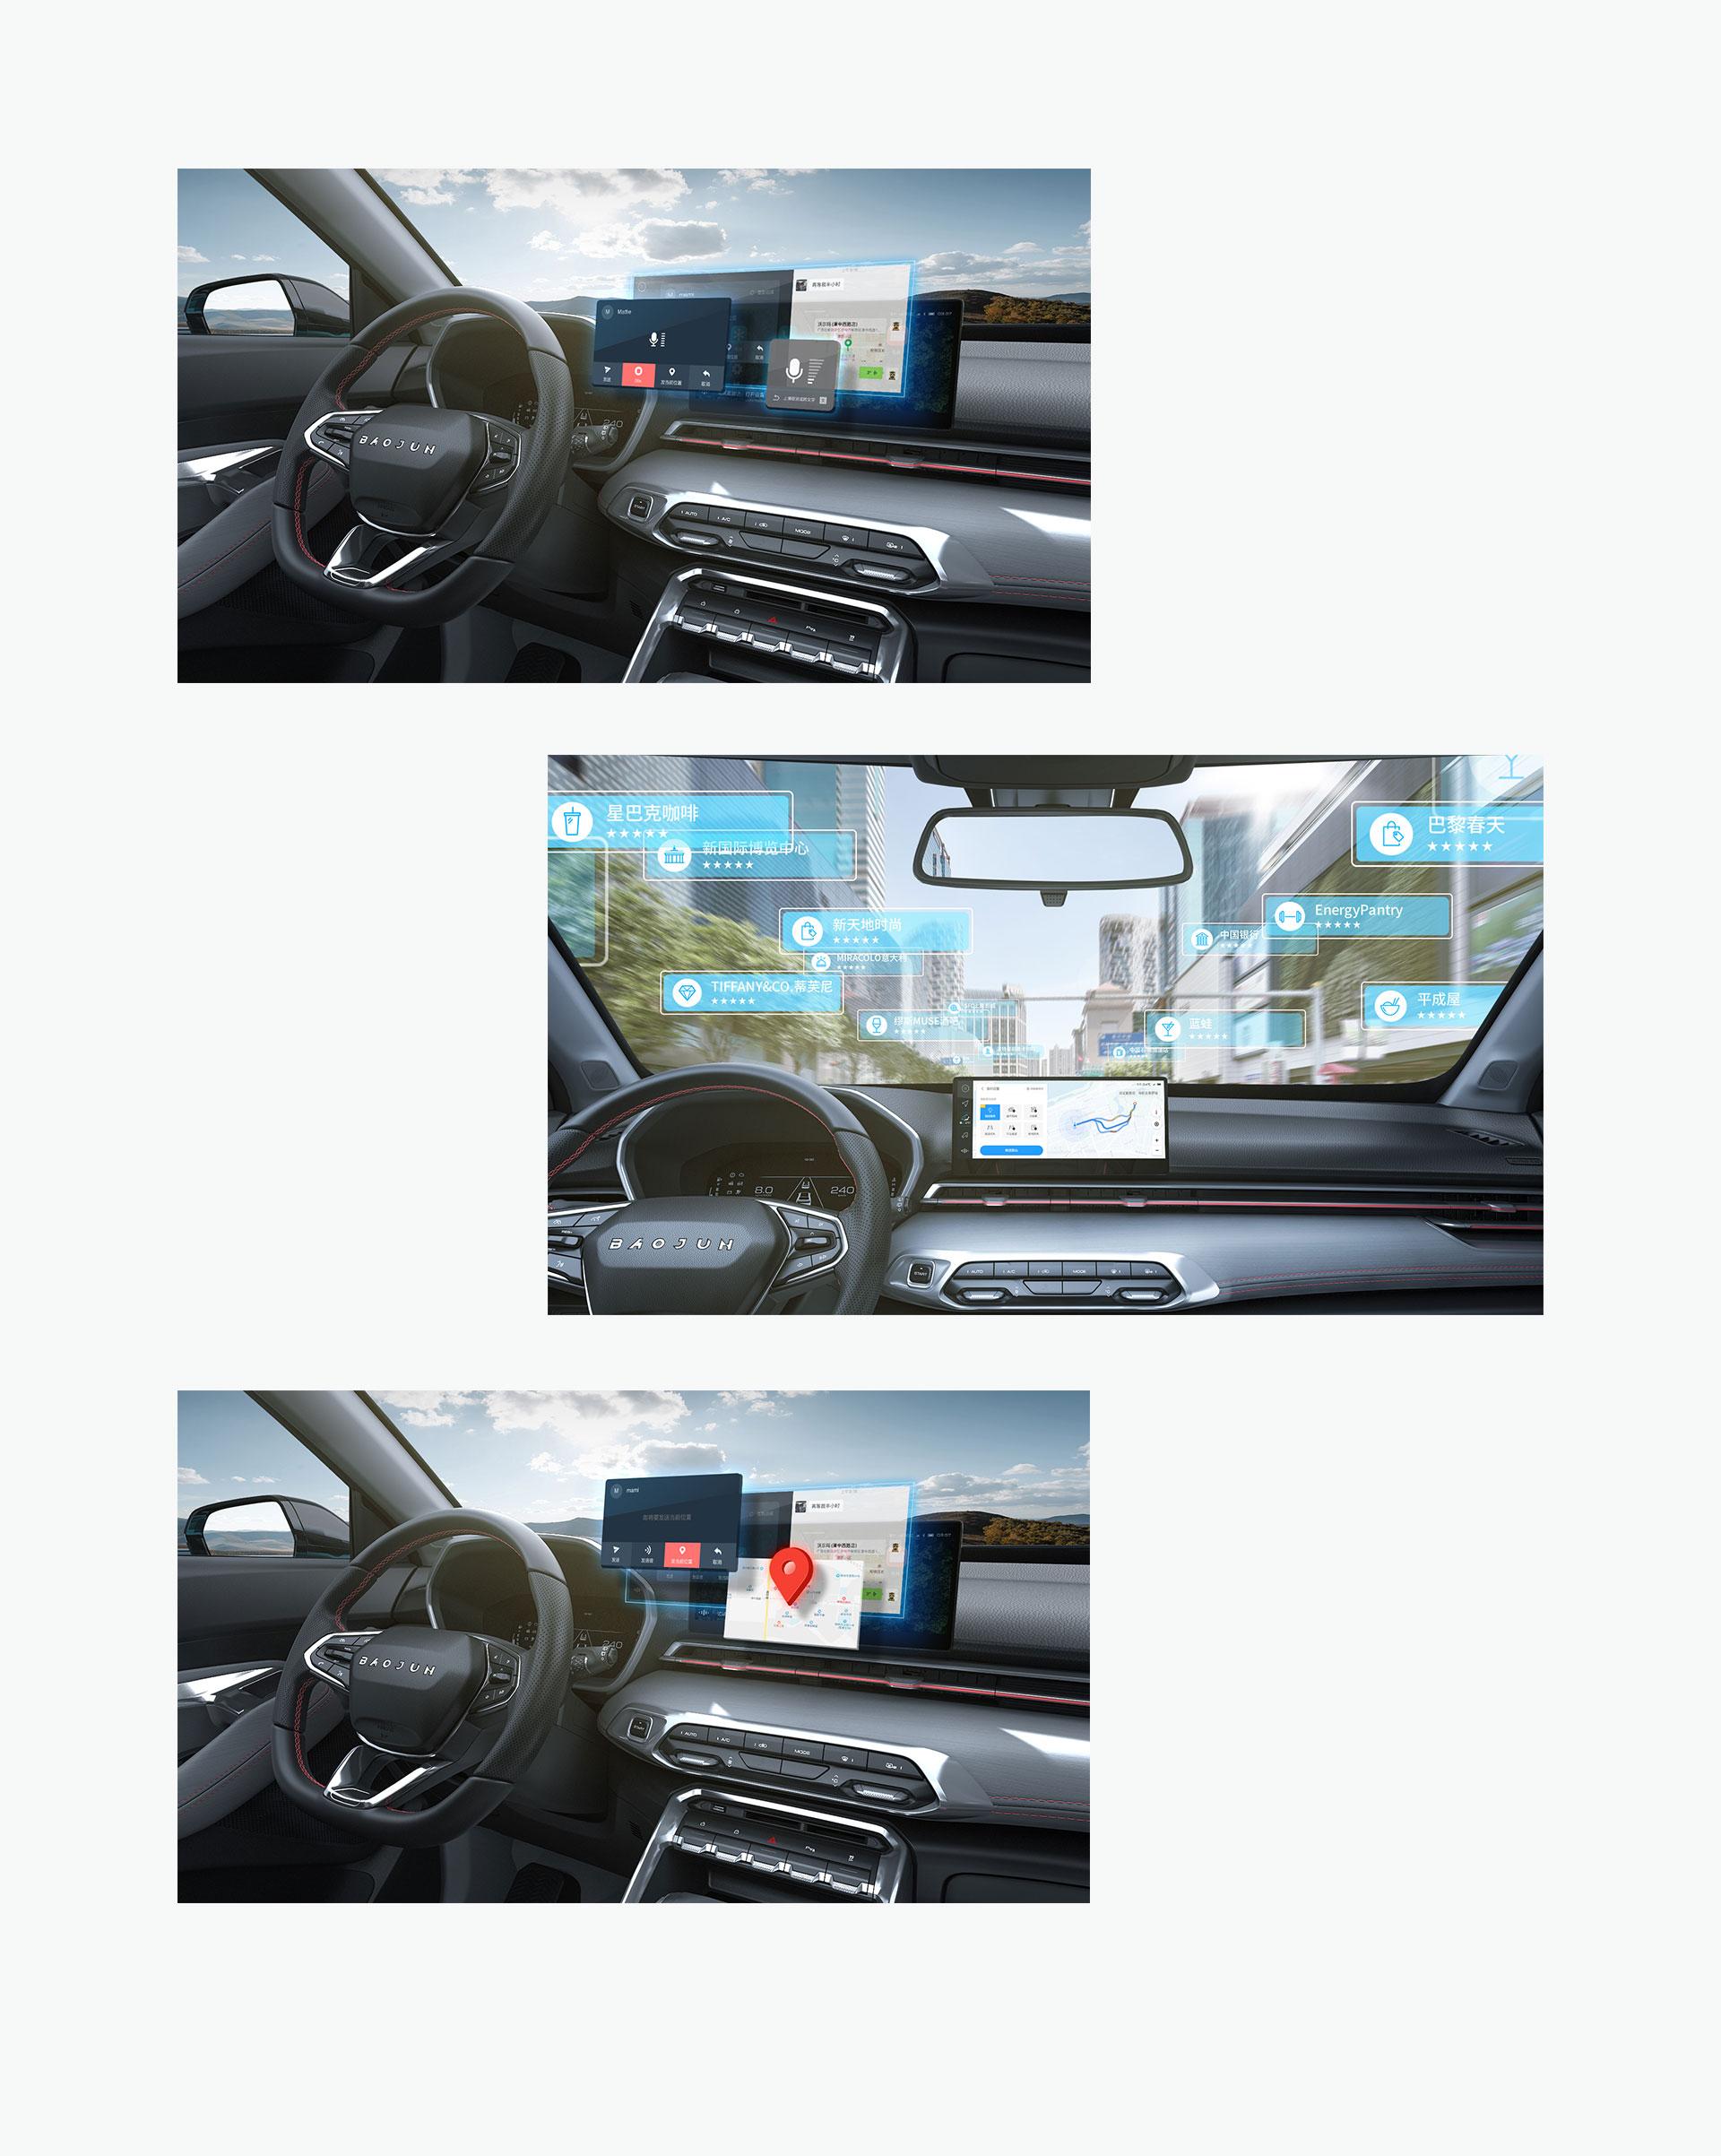 新寶駿RS-3,寶駿RS-3,寶駿RS3,智(zhi)能SUV,智(zhi)能互聯,語音微(wei)信,智(zhi)能導航(hang),語音控制